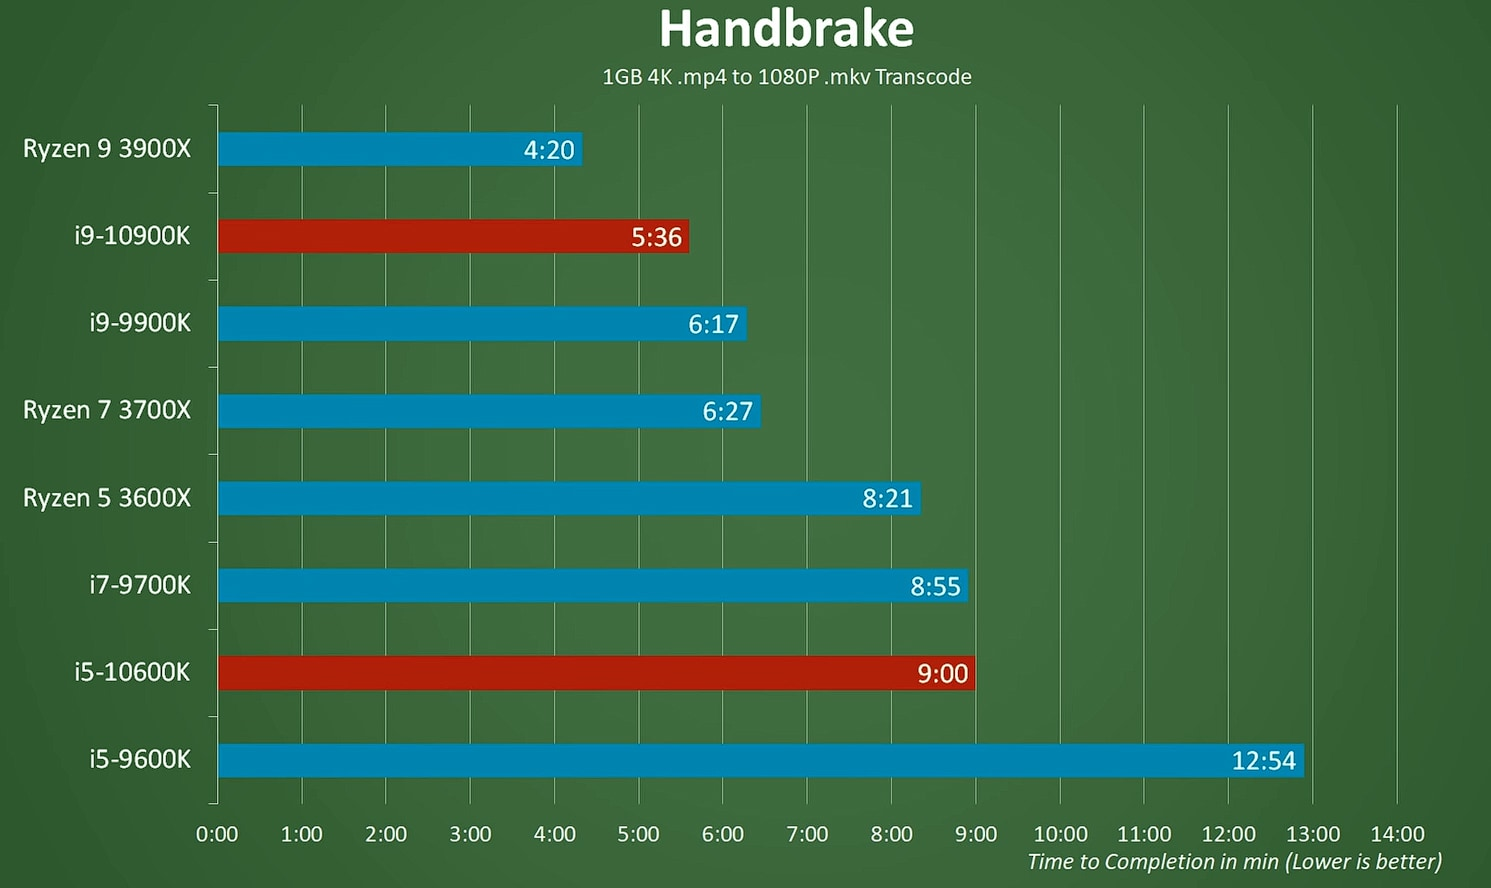 Handbrake test